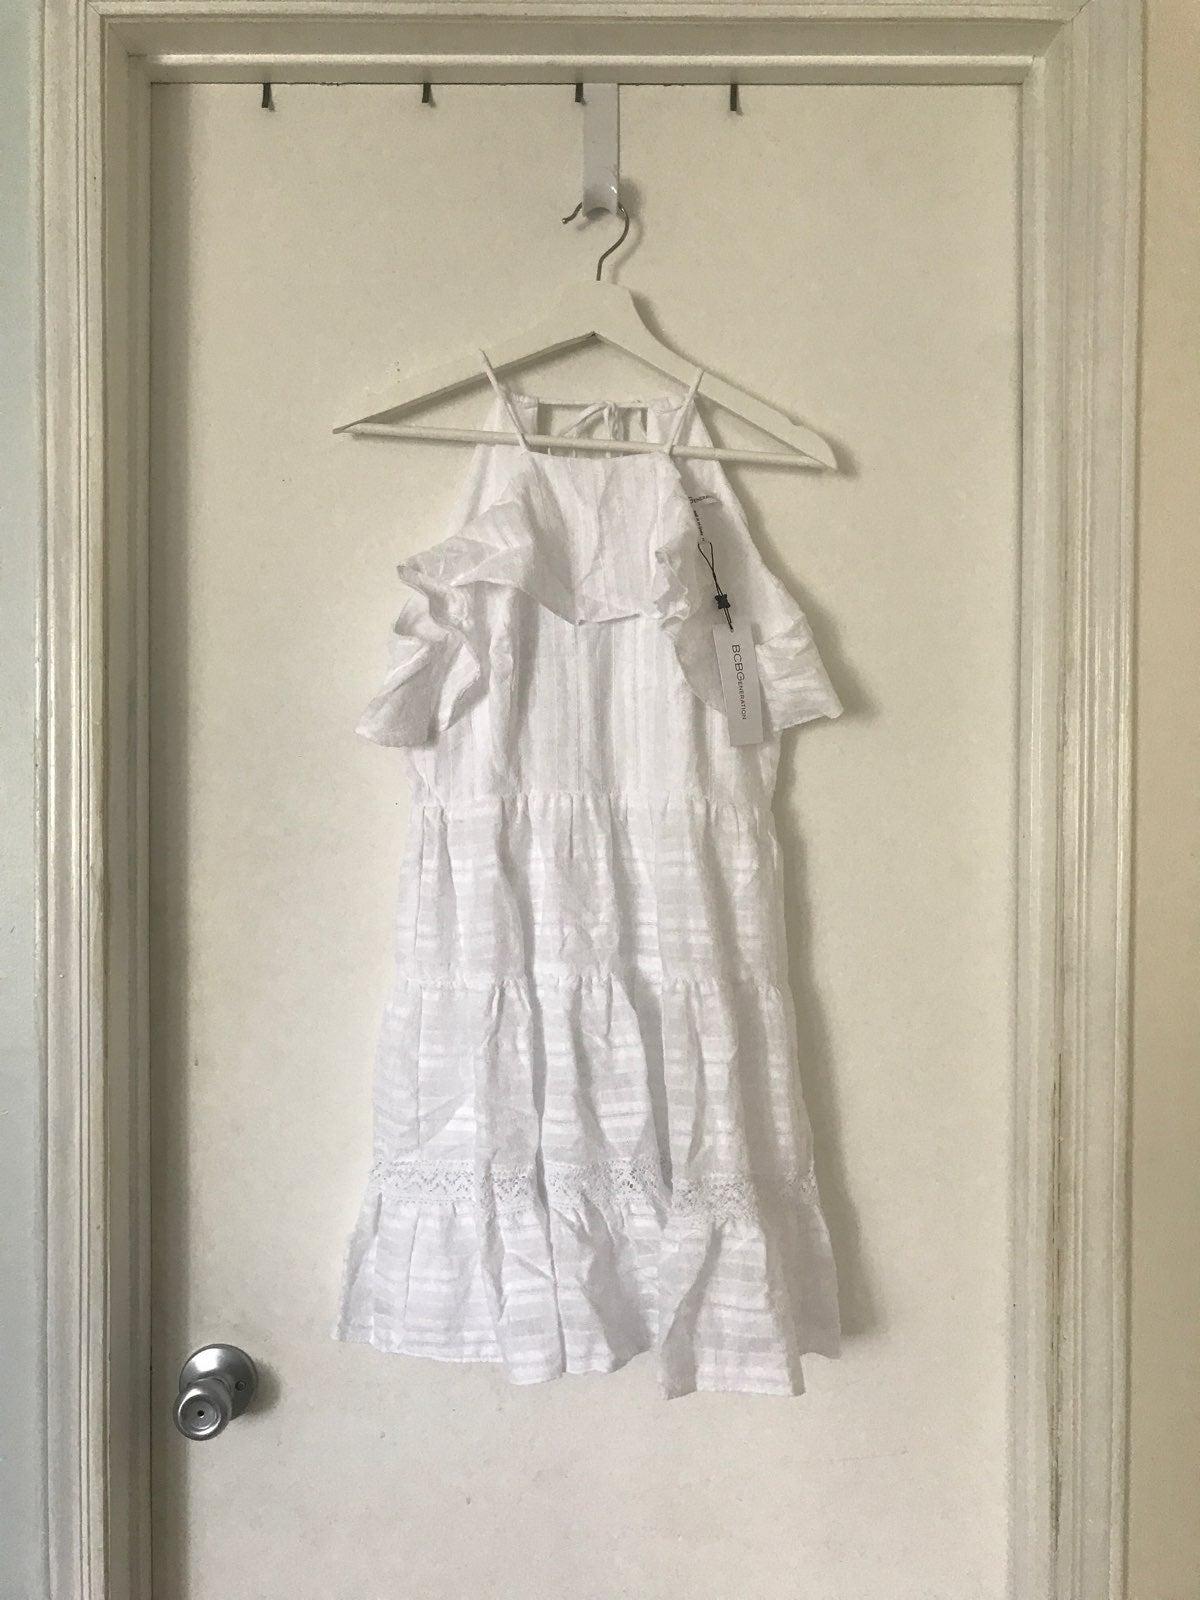 NWT BCBGeneration White Ruffle Dress